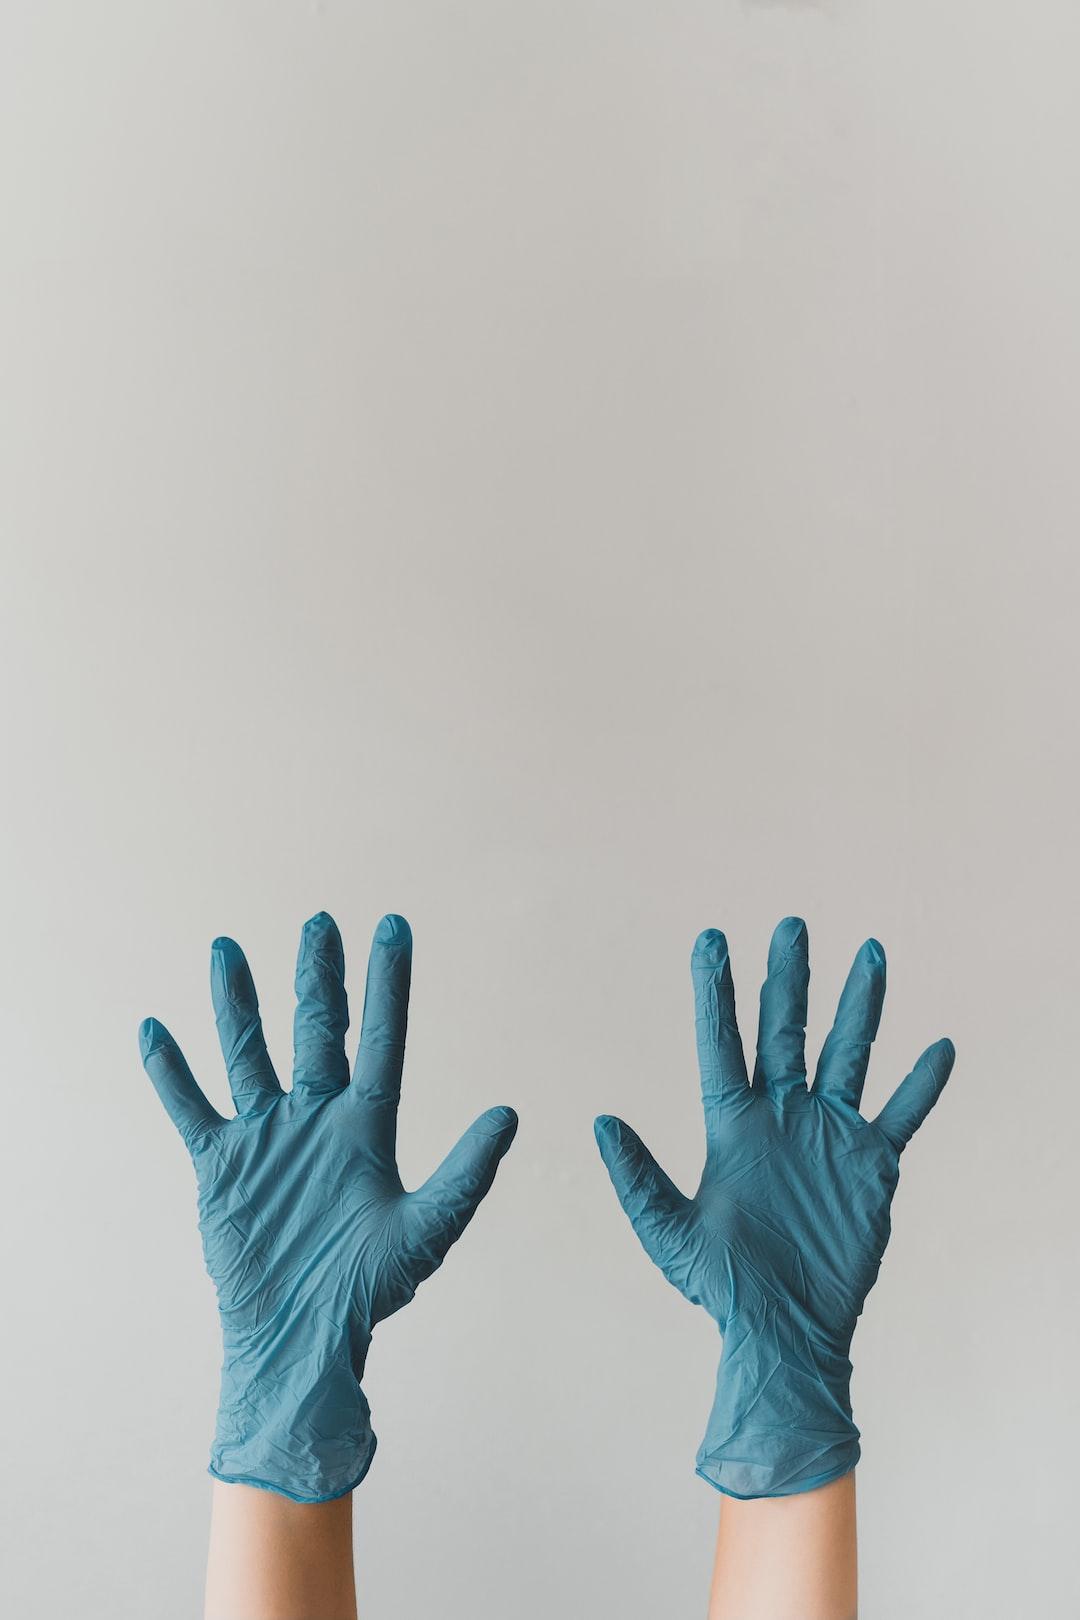 Cut Resistant Gloves: Levels of Cut Resistance Explained